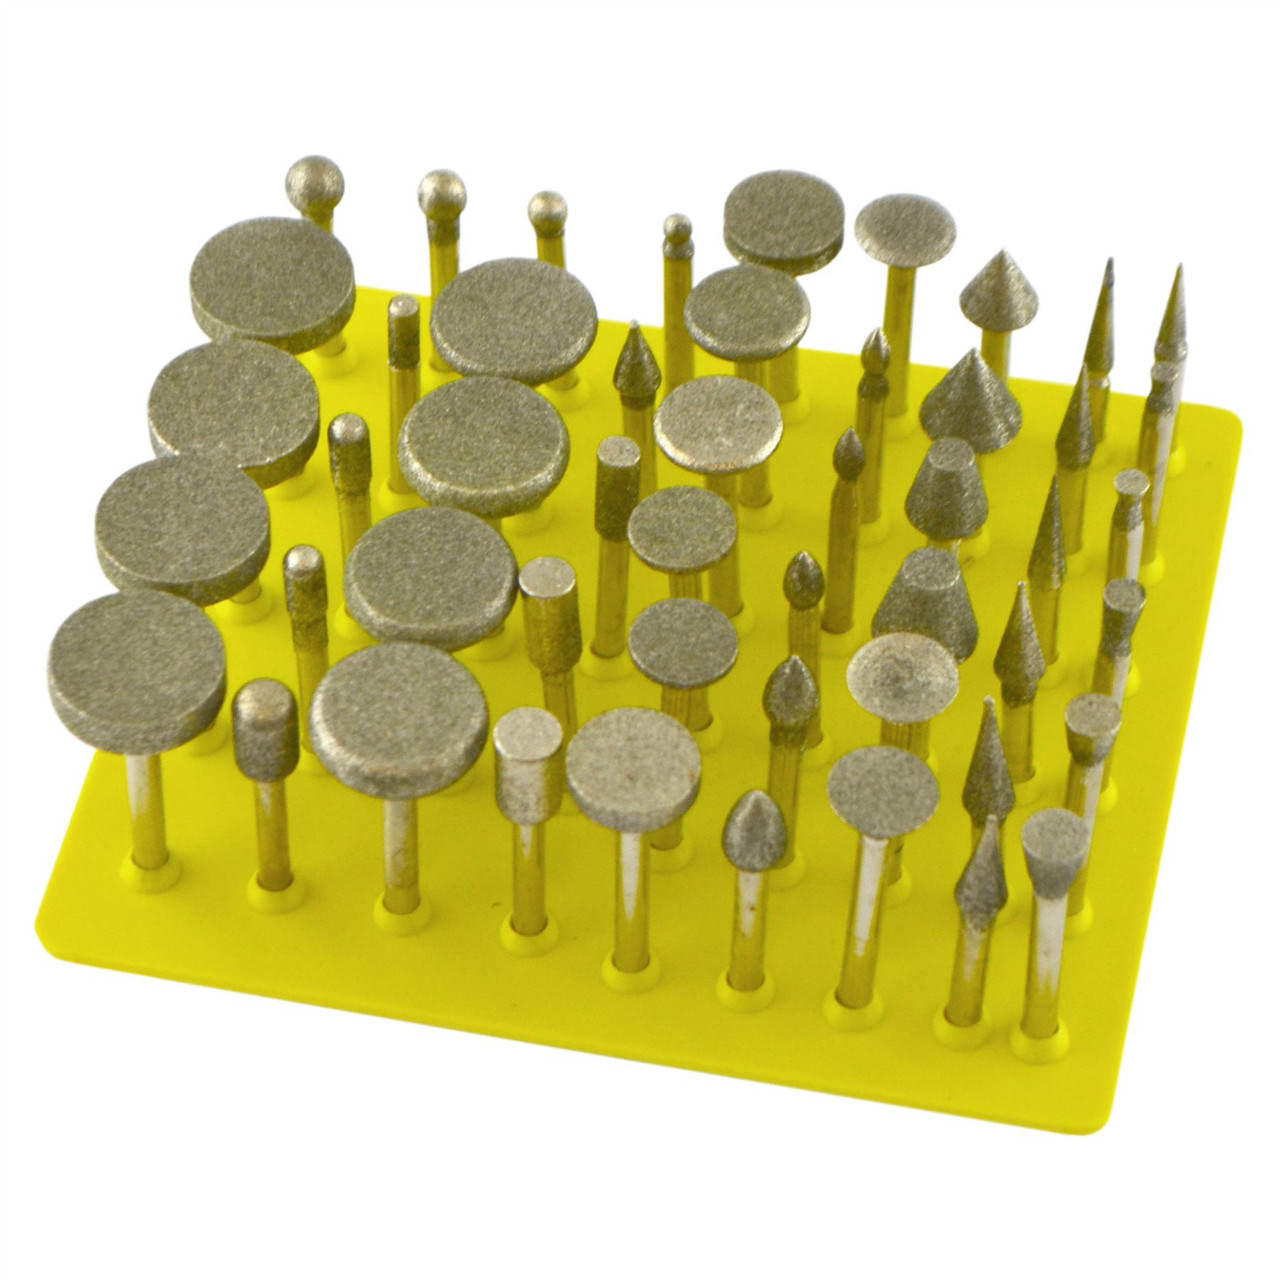 "50pc Diamond Burr Set 120 Grit Carving Engraving Rotary Etching 1/8"" Shank TE886"